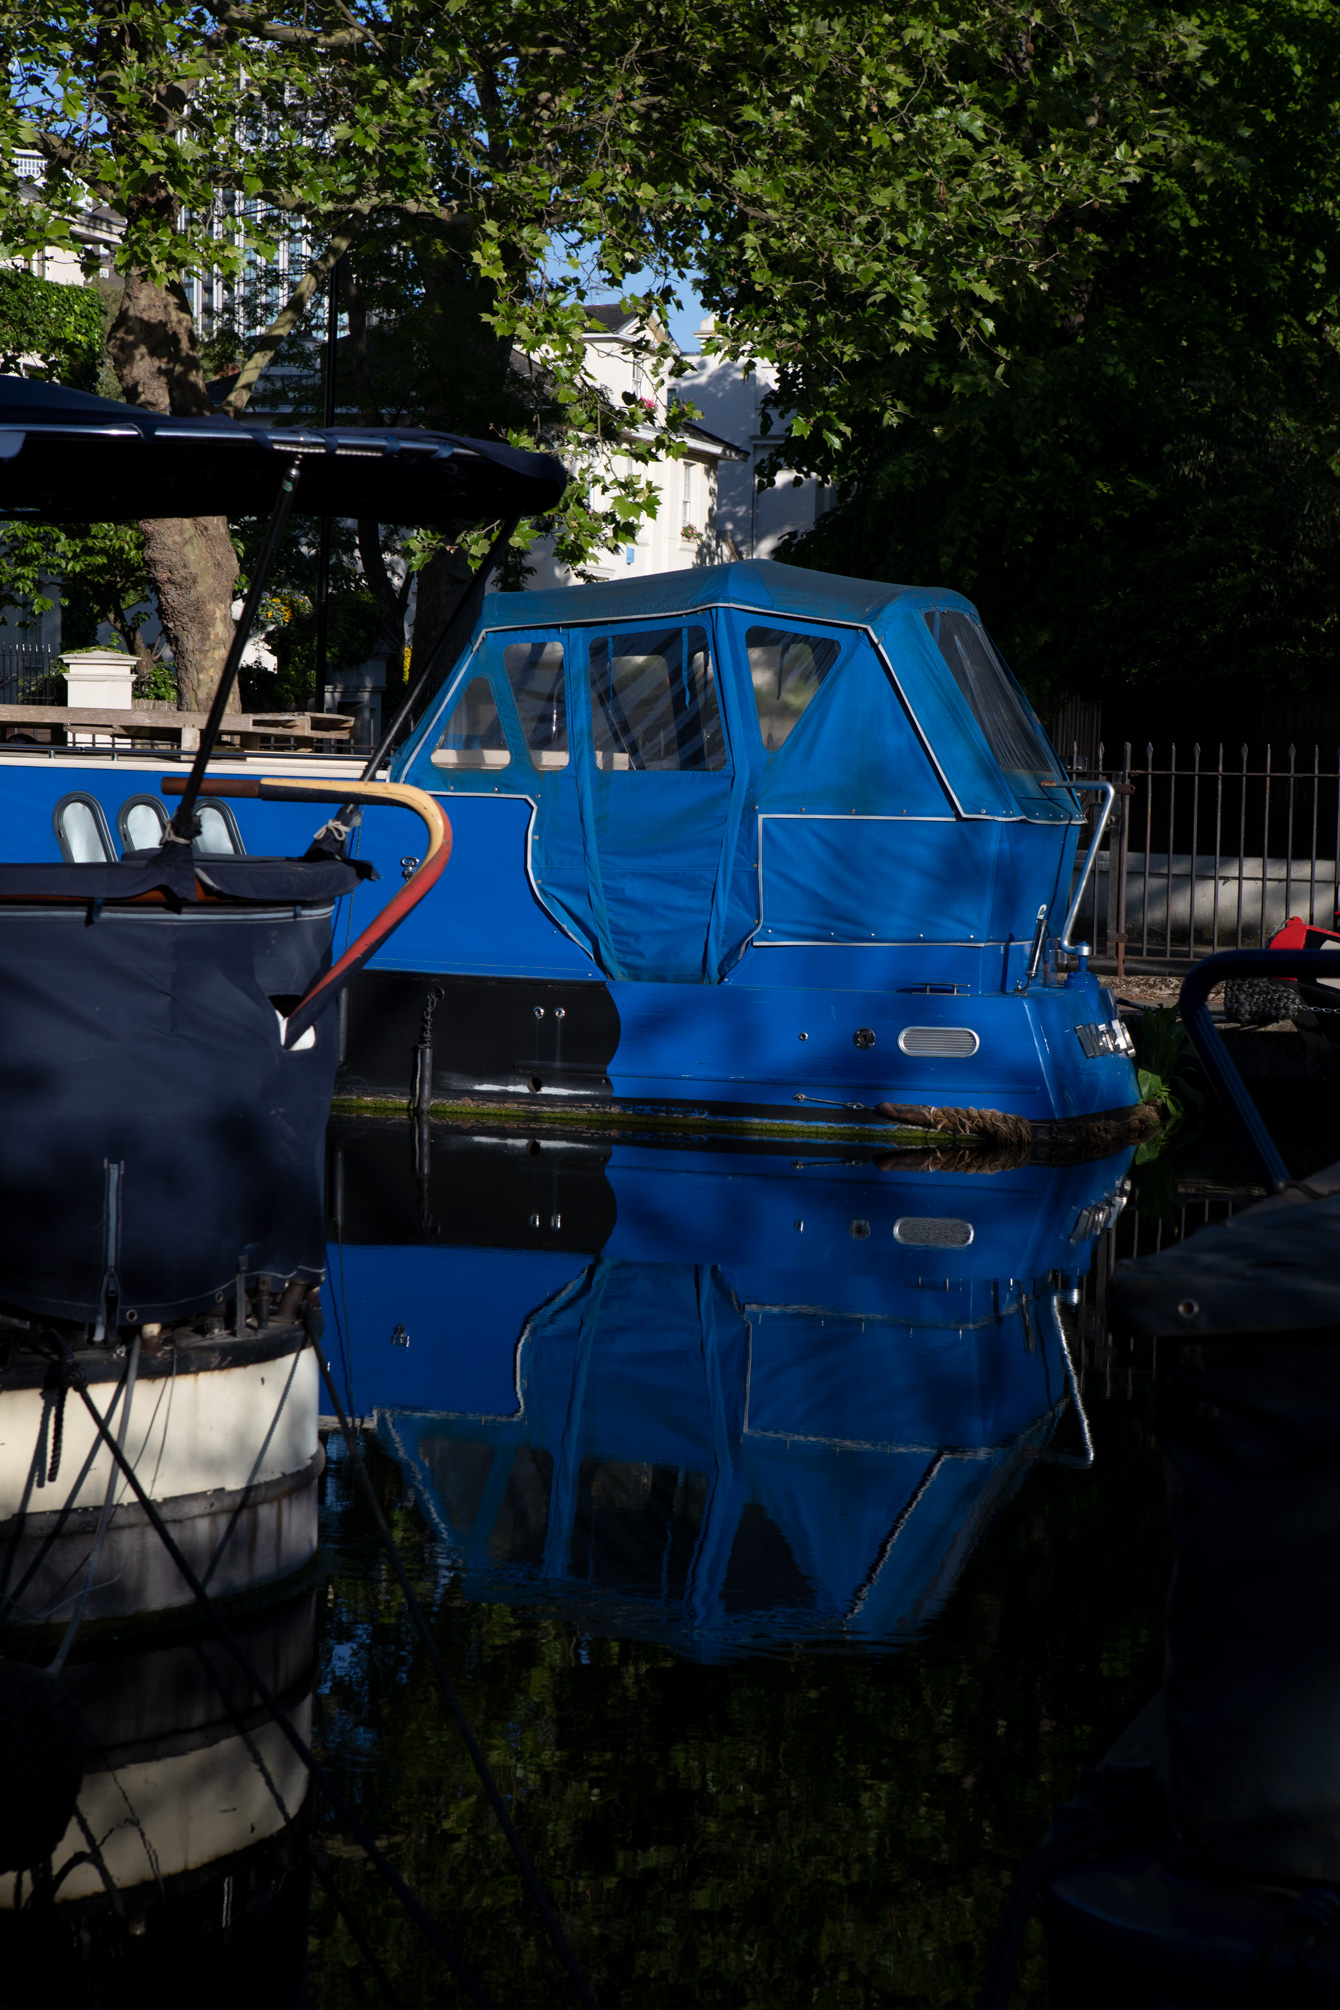 little-venice-london-maida-vale-canal-boat